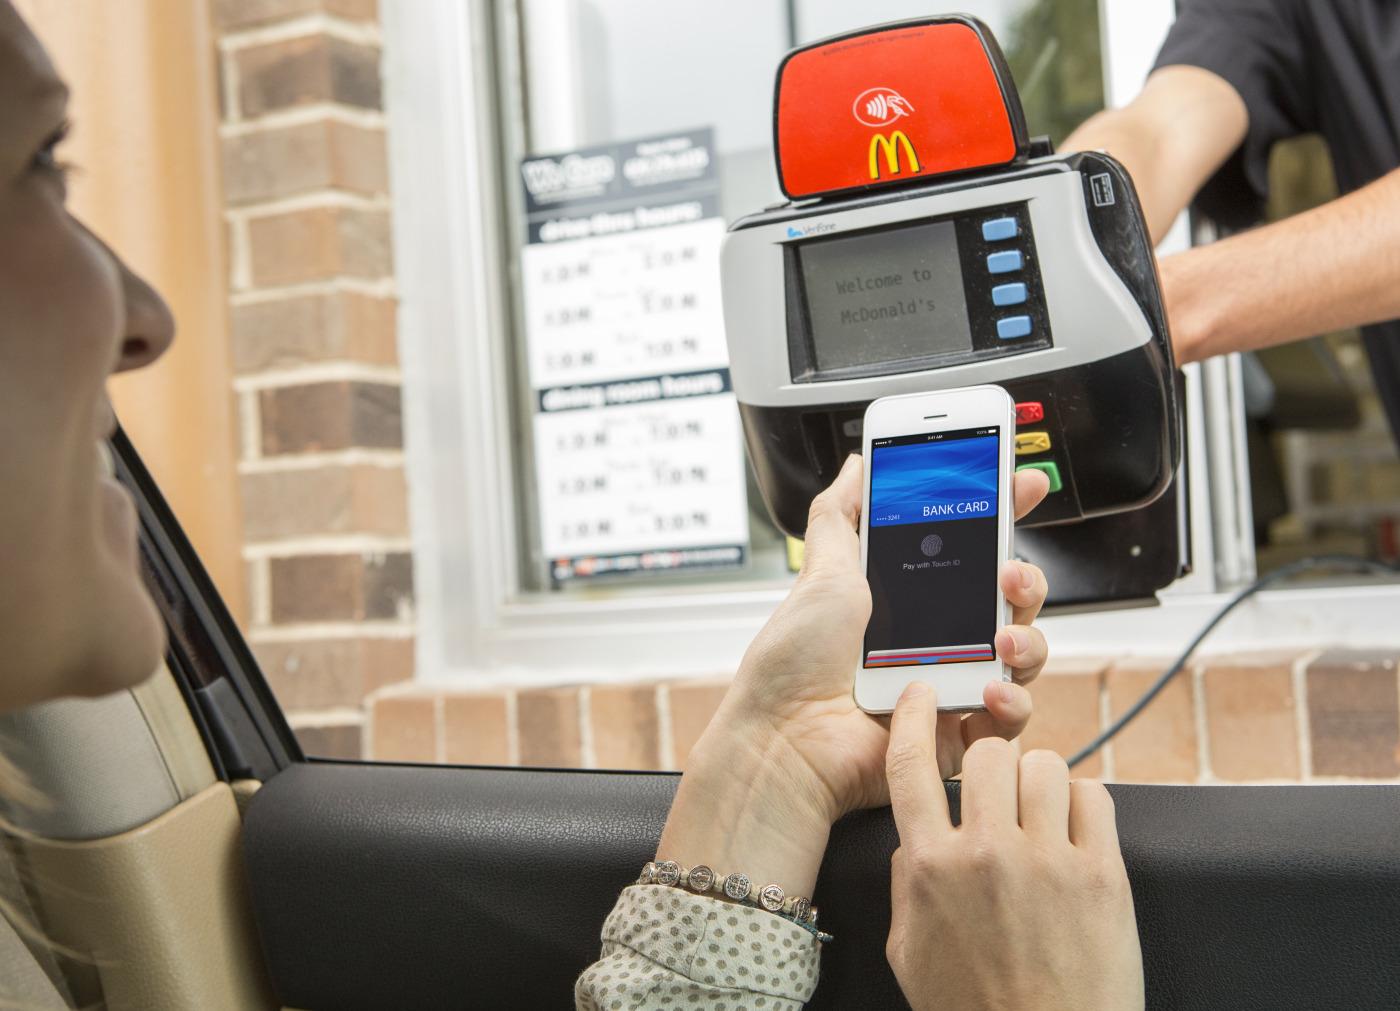 McDonalds Drive Thru Apple Pay